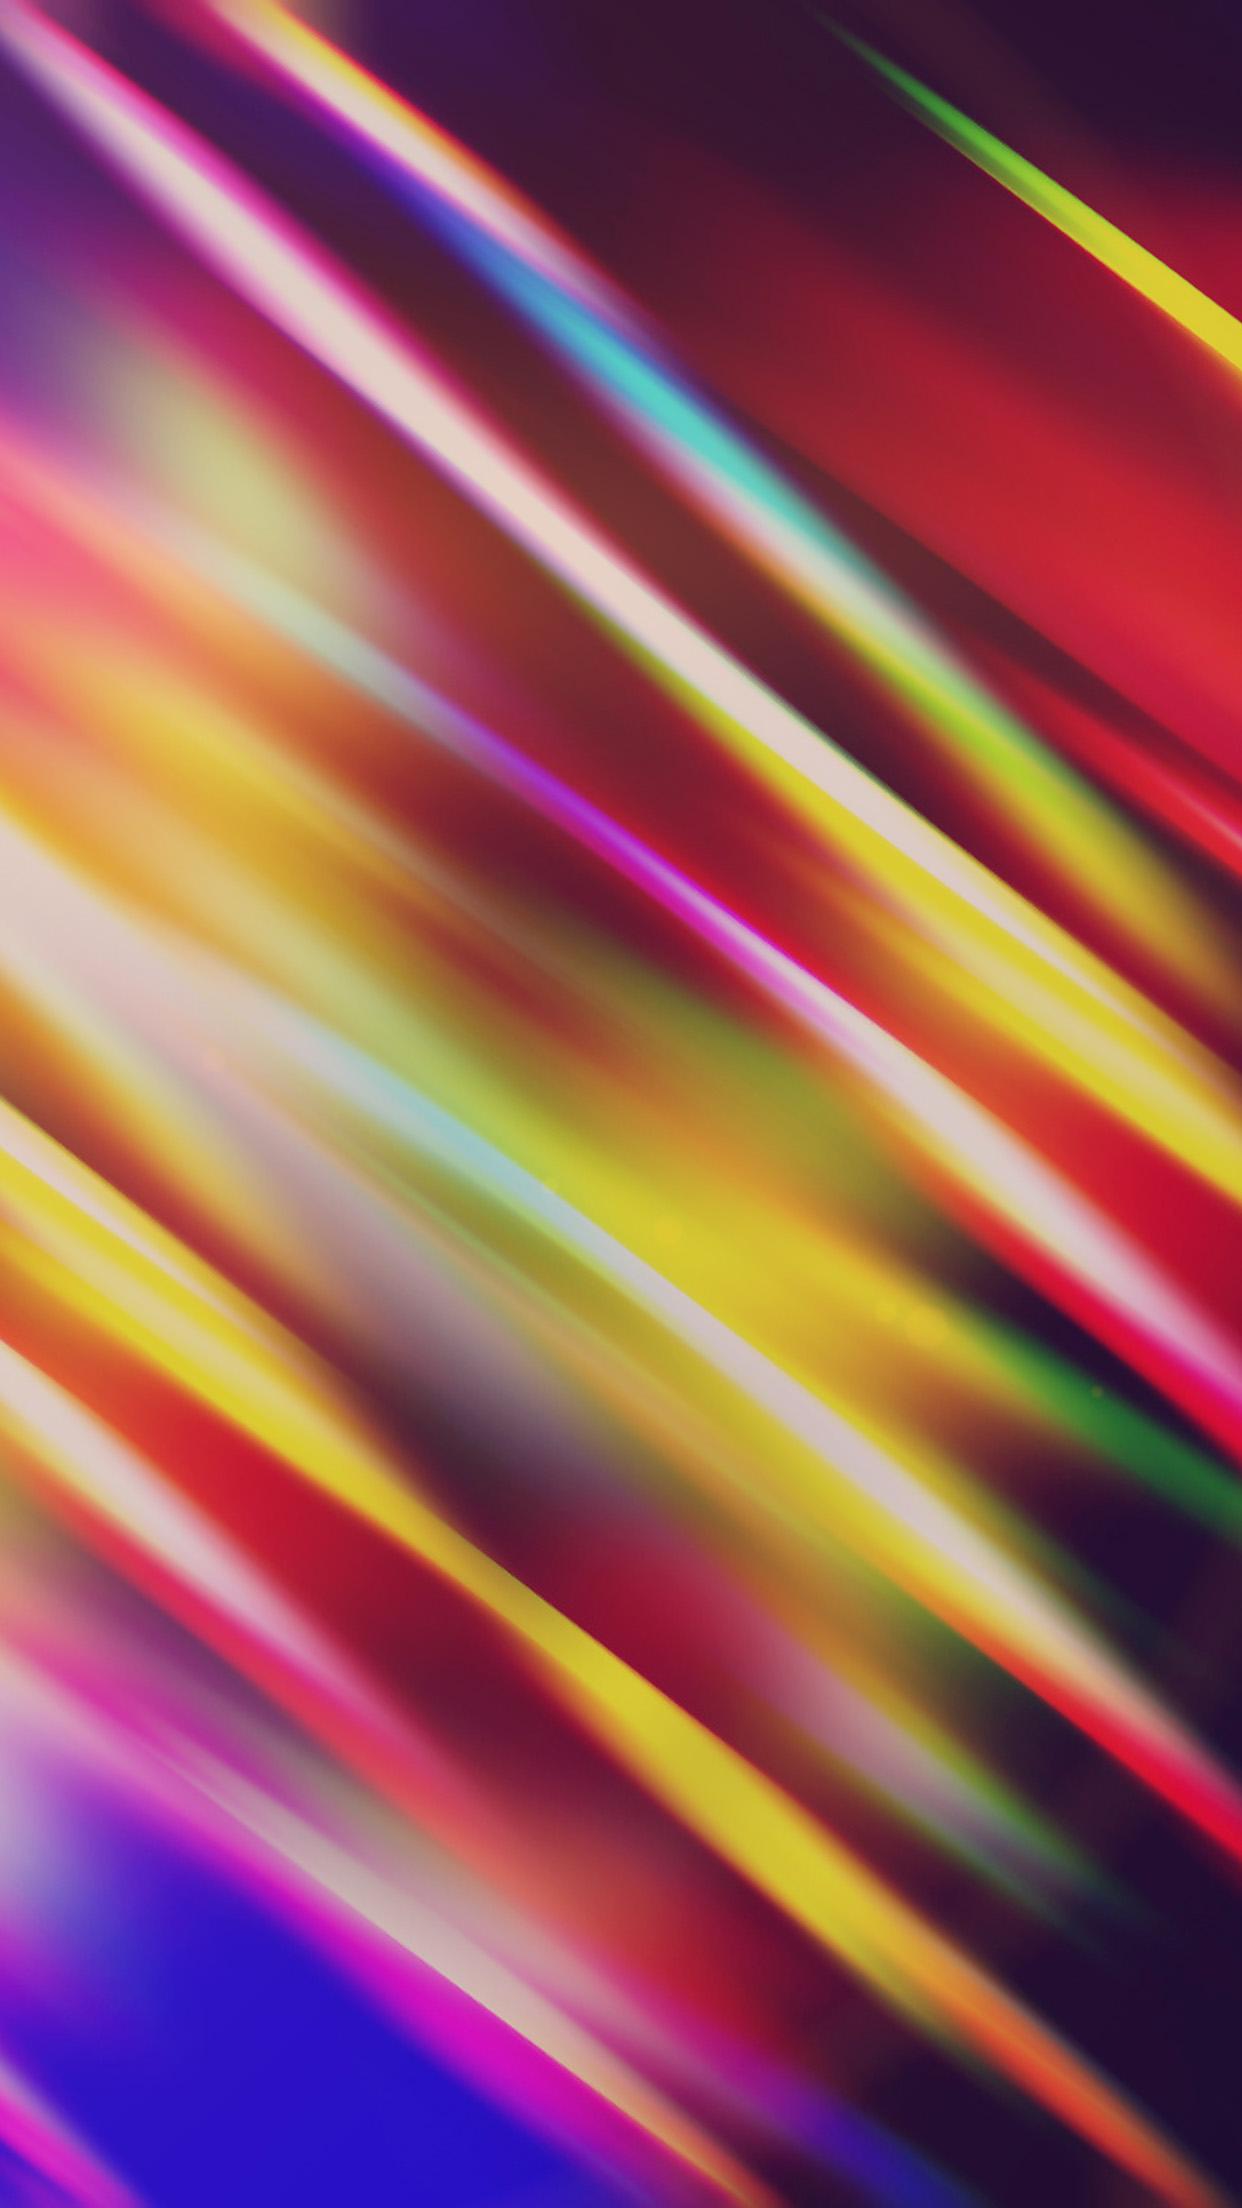 wallpaper iphone rainbow: Vj81-chrome-lights-rainbow